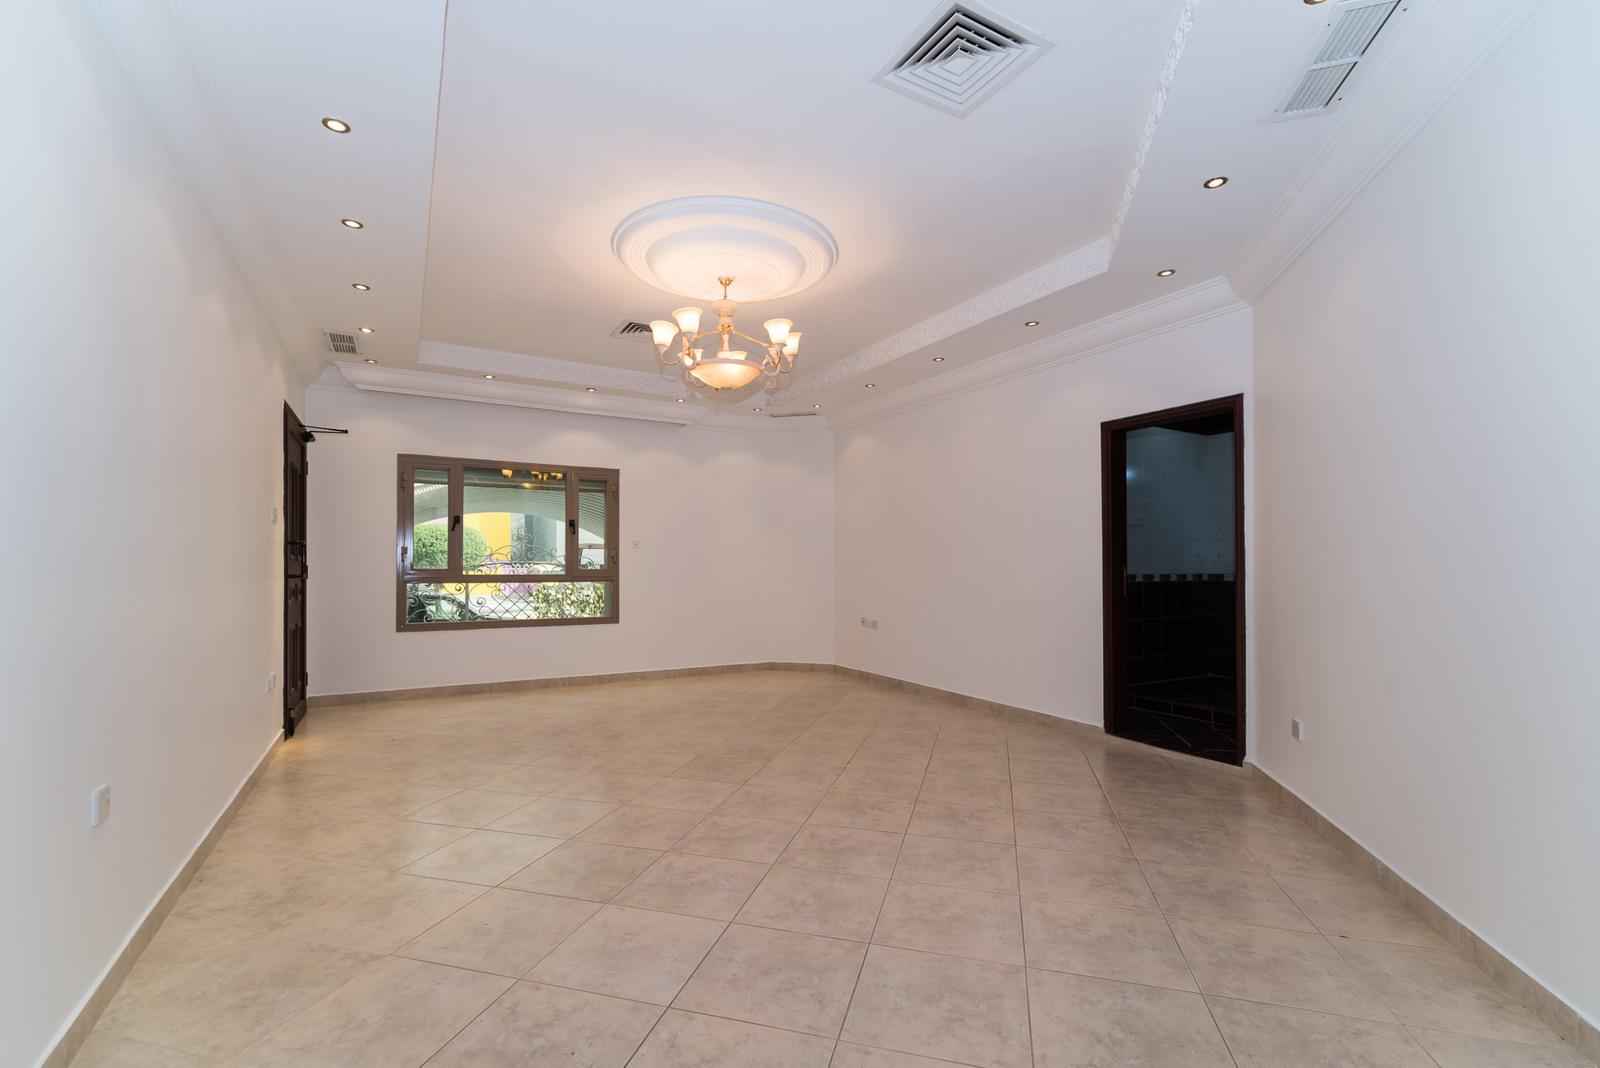 Salwa – older, rennovated, five bedroom ground floor w/yard